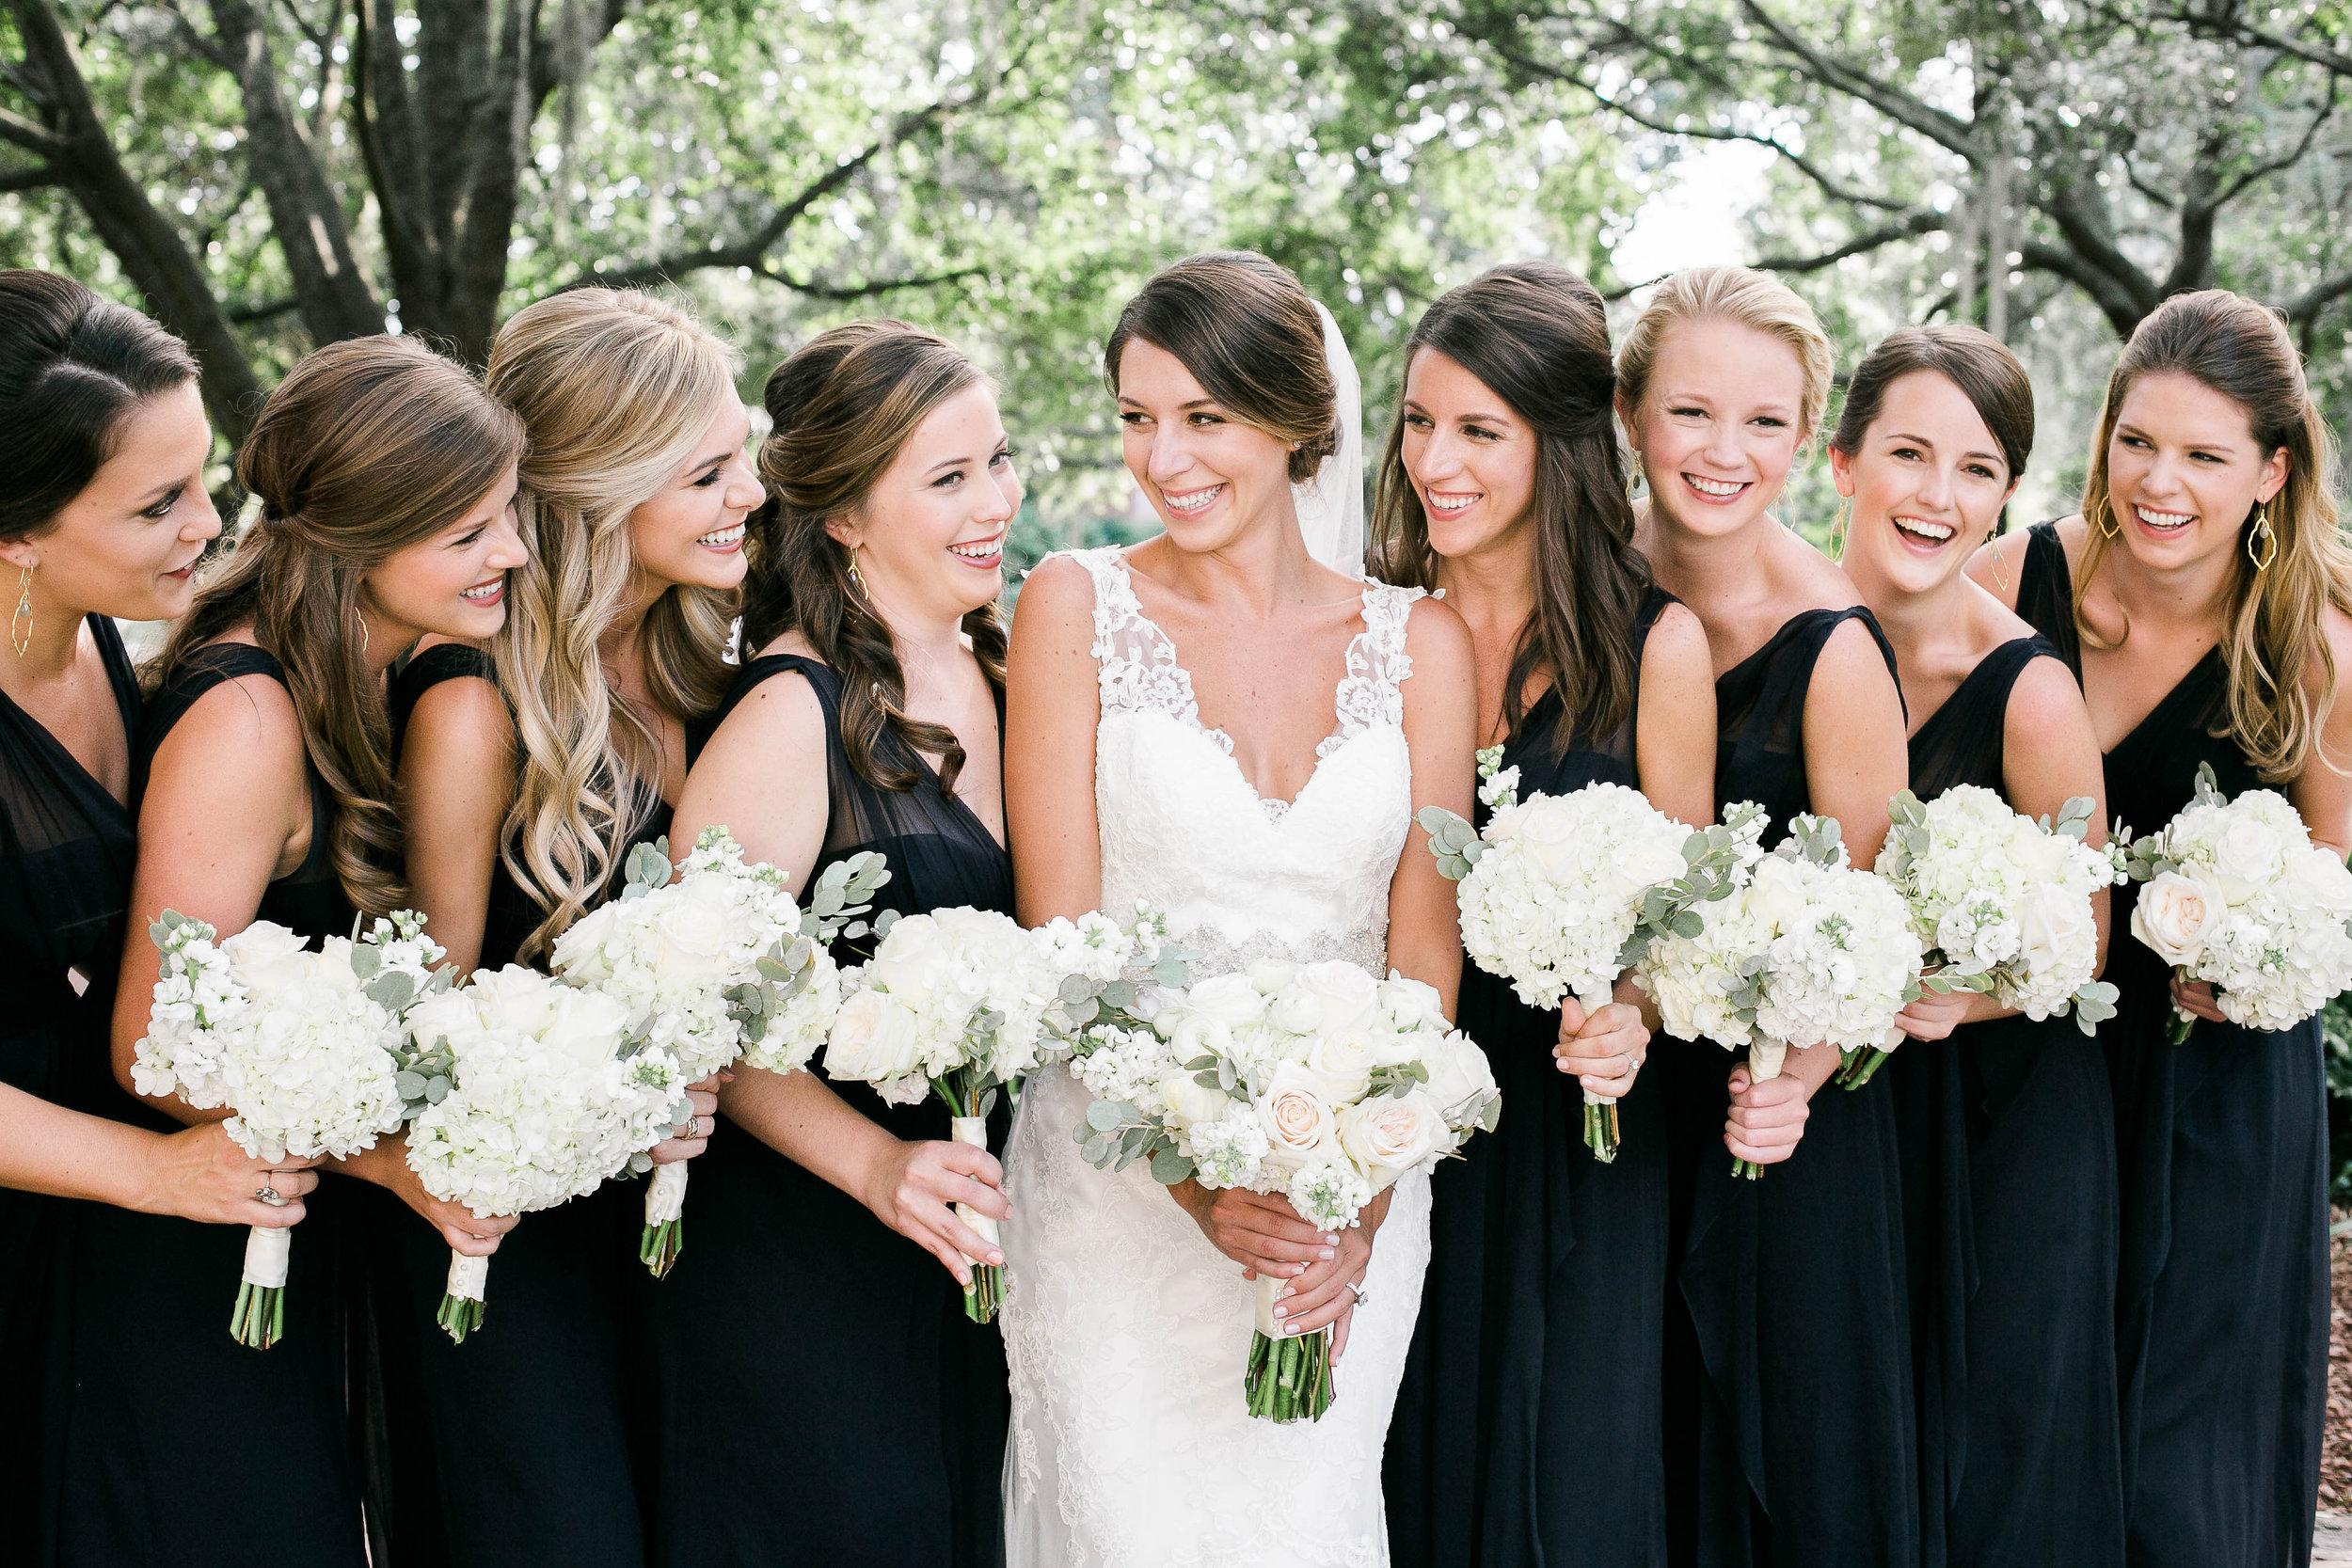 Long navy Amsale bridesmaids dresses from Bleubelle Bridal in Savannah, GA